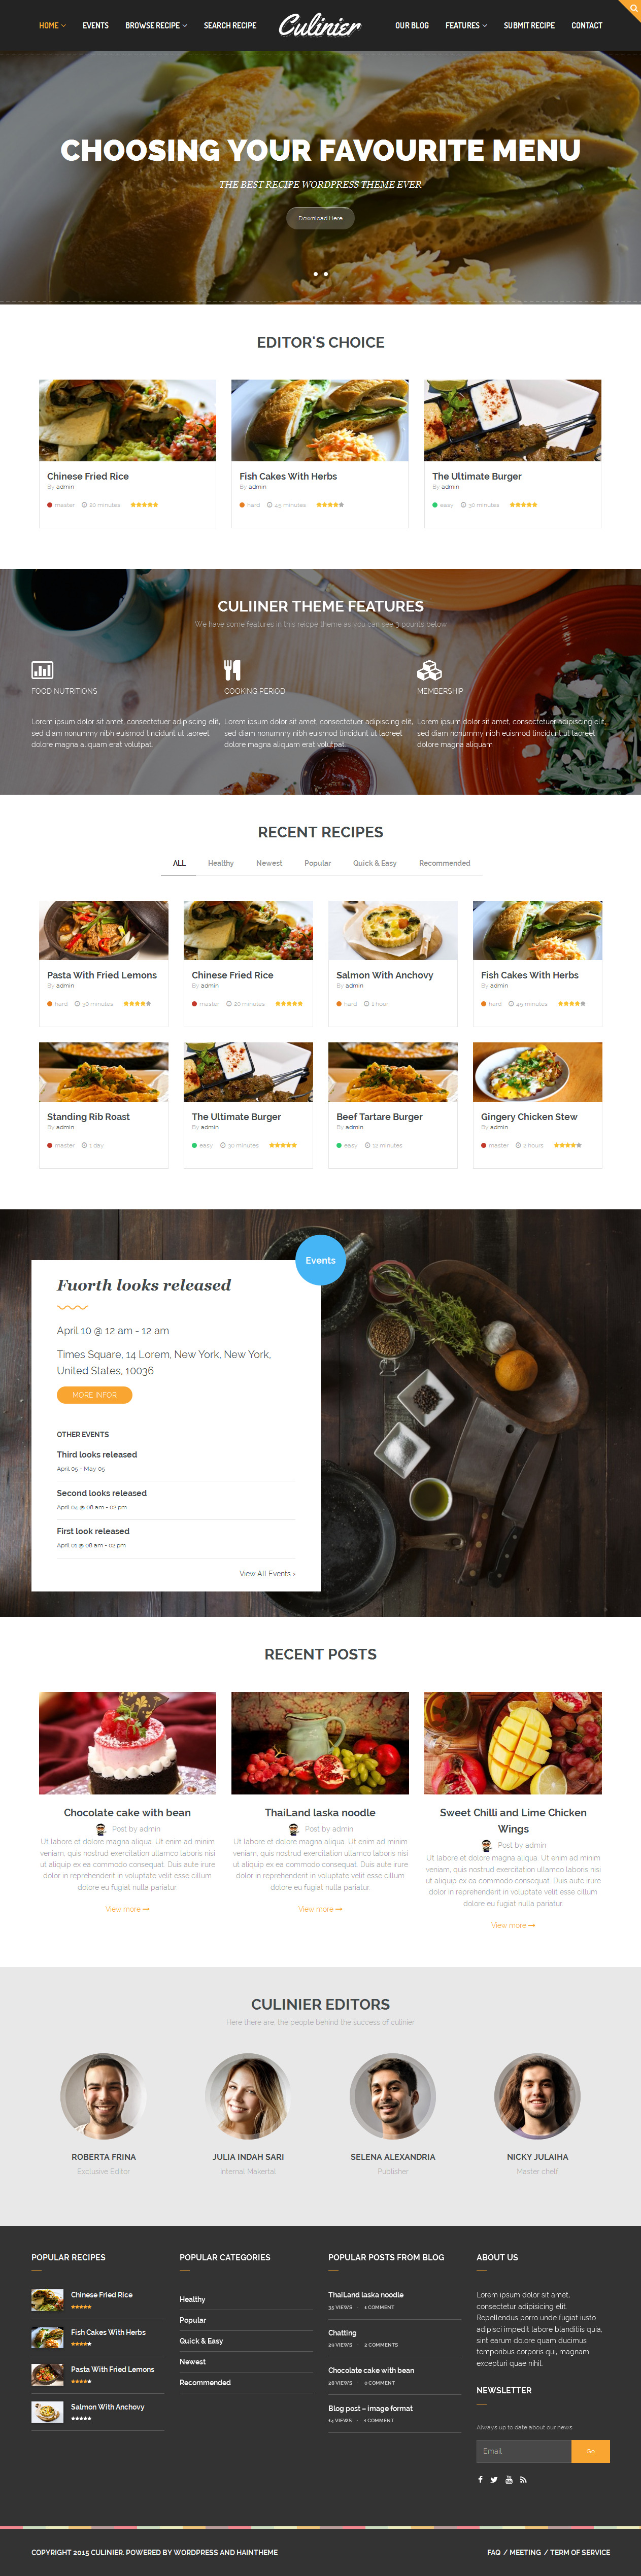 Culinier food recipe wordpress theme wordpress simple web culinier food recipe wordpress theme forumfinder Choice Image